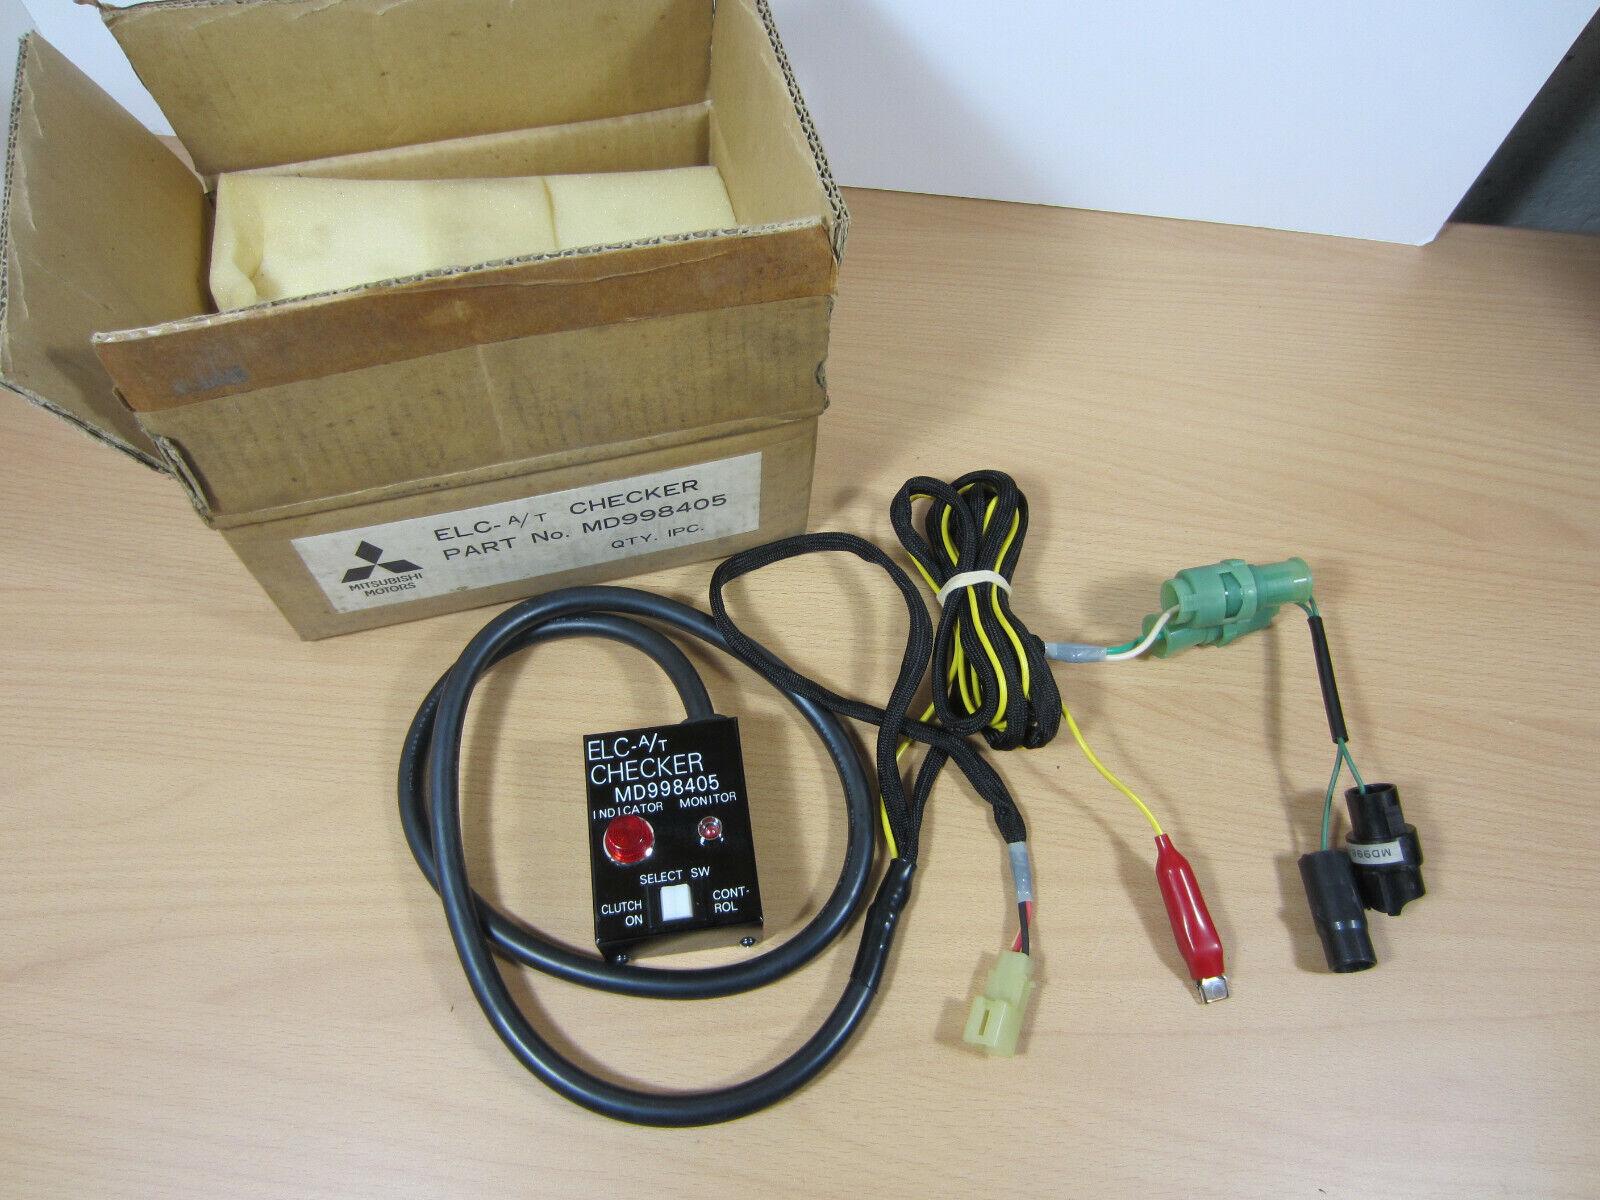 Wosume Multimeter Meter Test Set C/âble de sonde